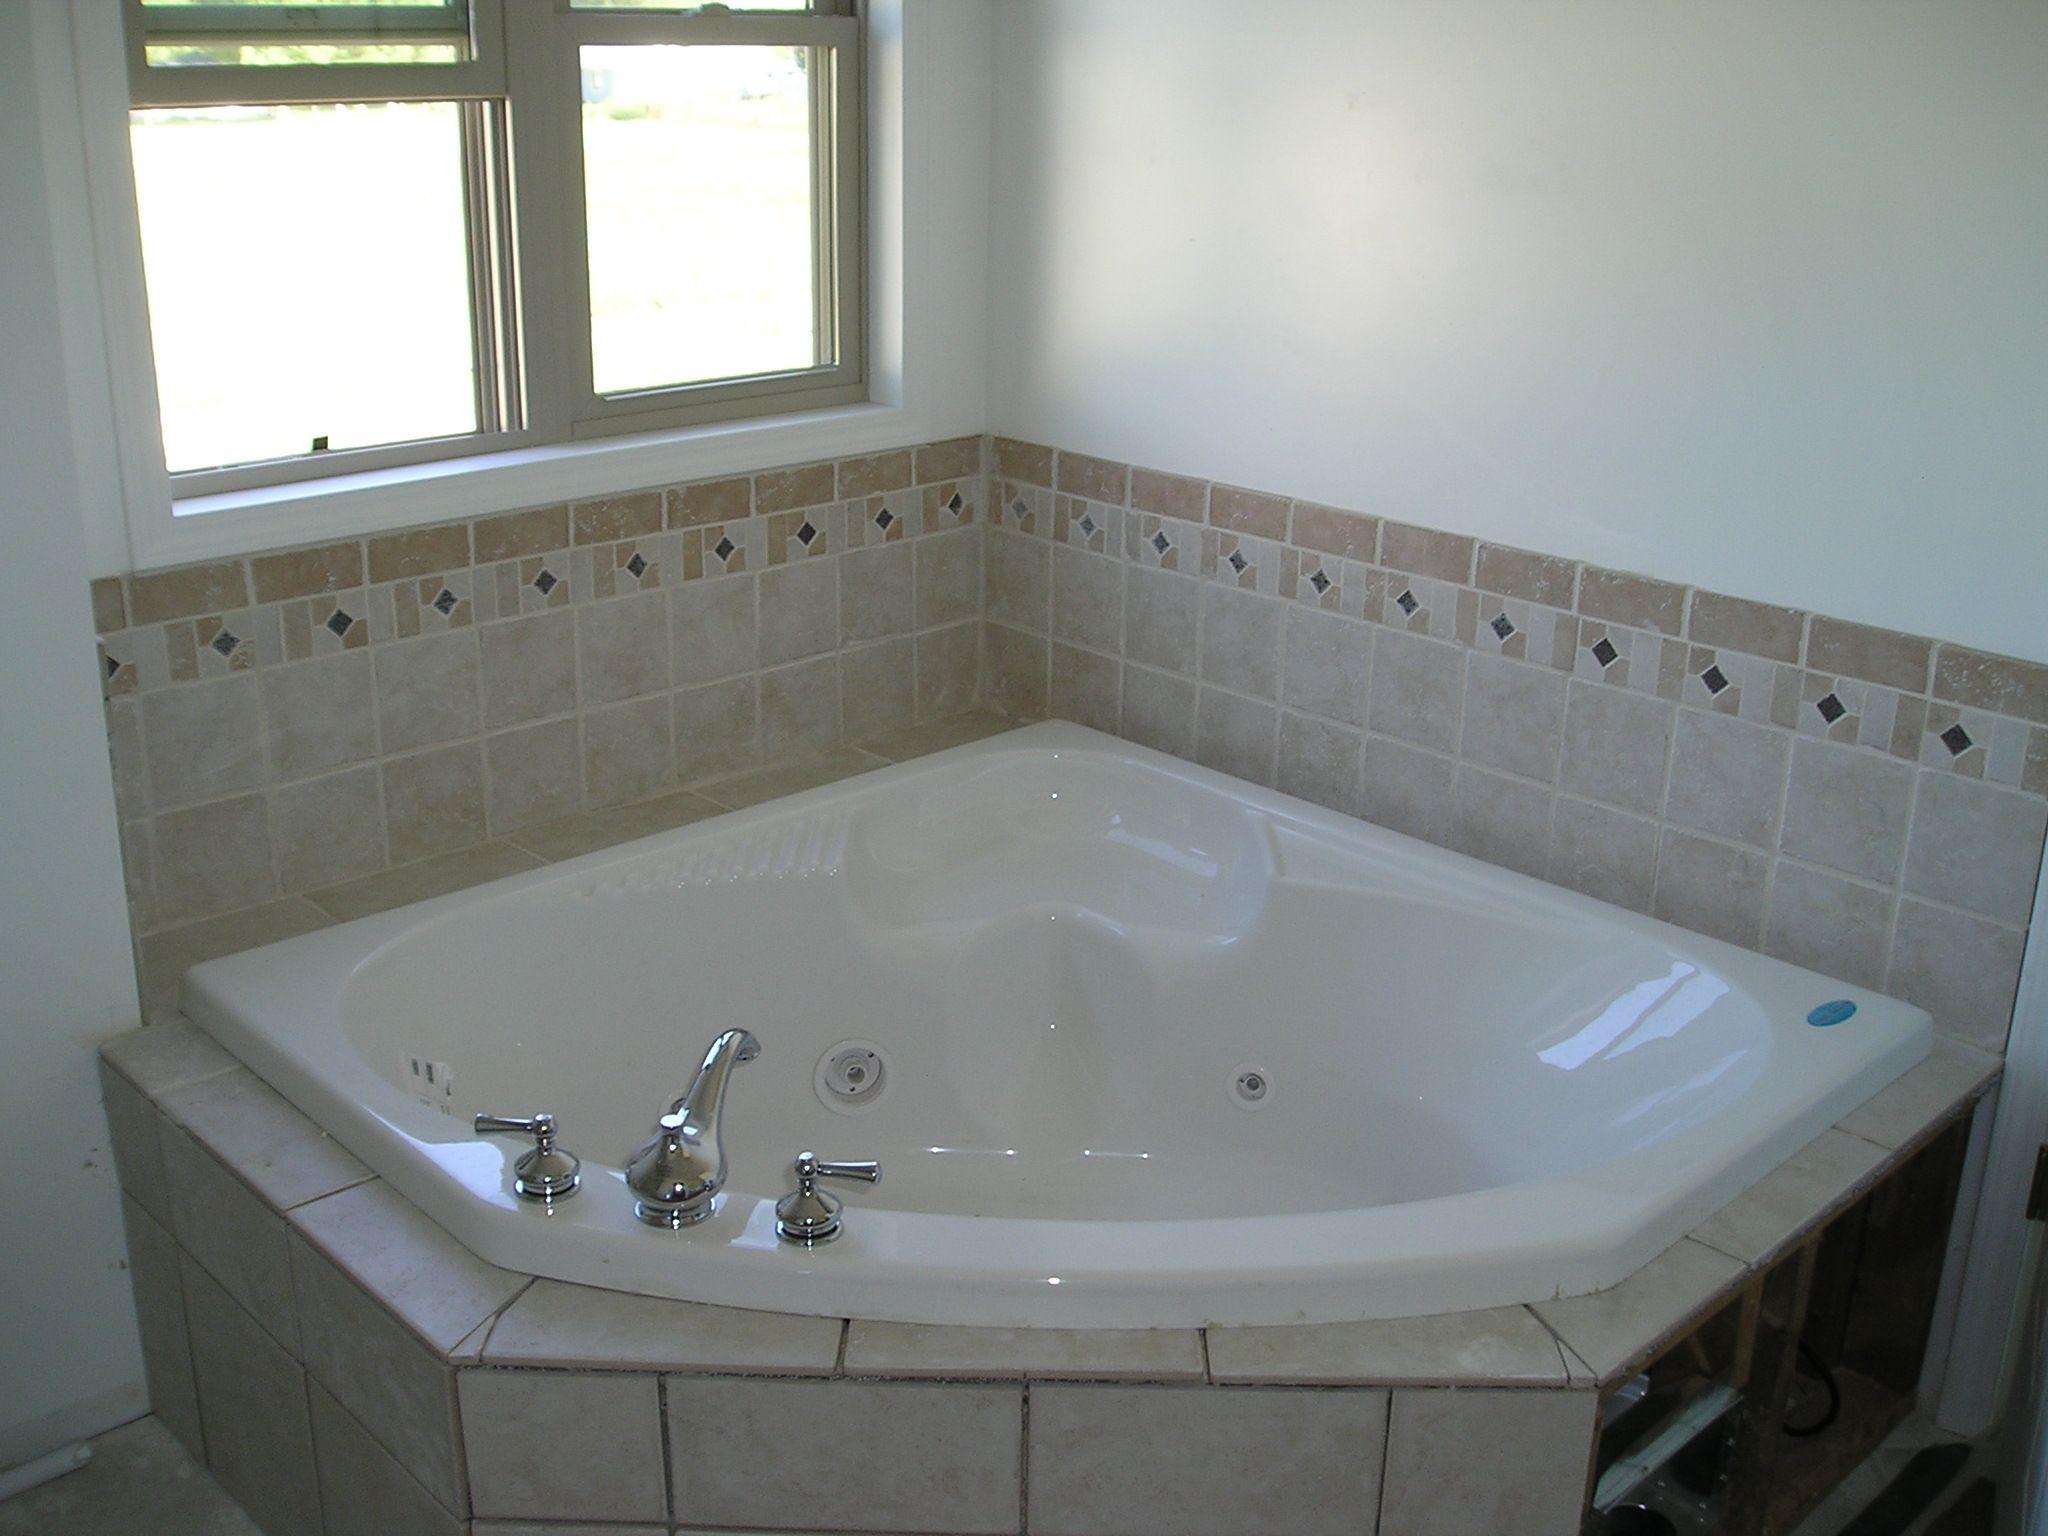 Corner Tub Shower Ideas Bathroom Contemporary Vanity Glass Block Shower With Seat Tiled Shower Bathtub Design